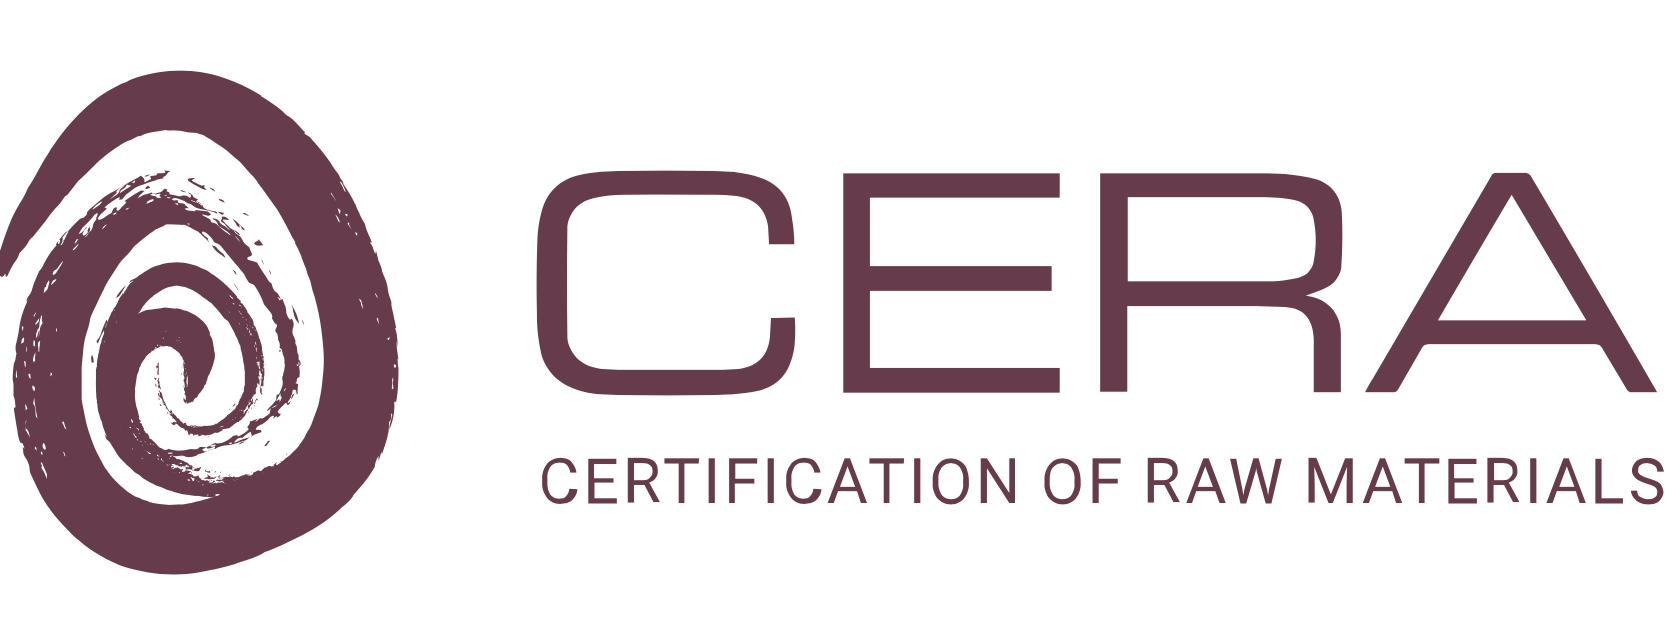 CERA: Certification of raw materials – EIT RawMaterials